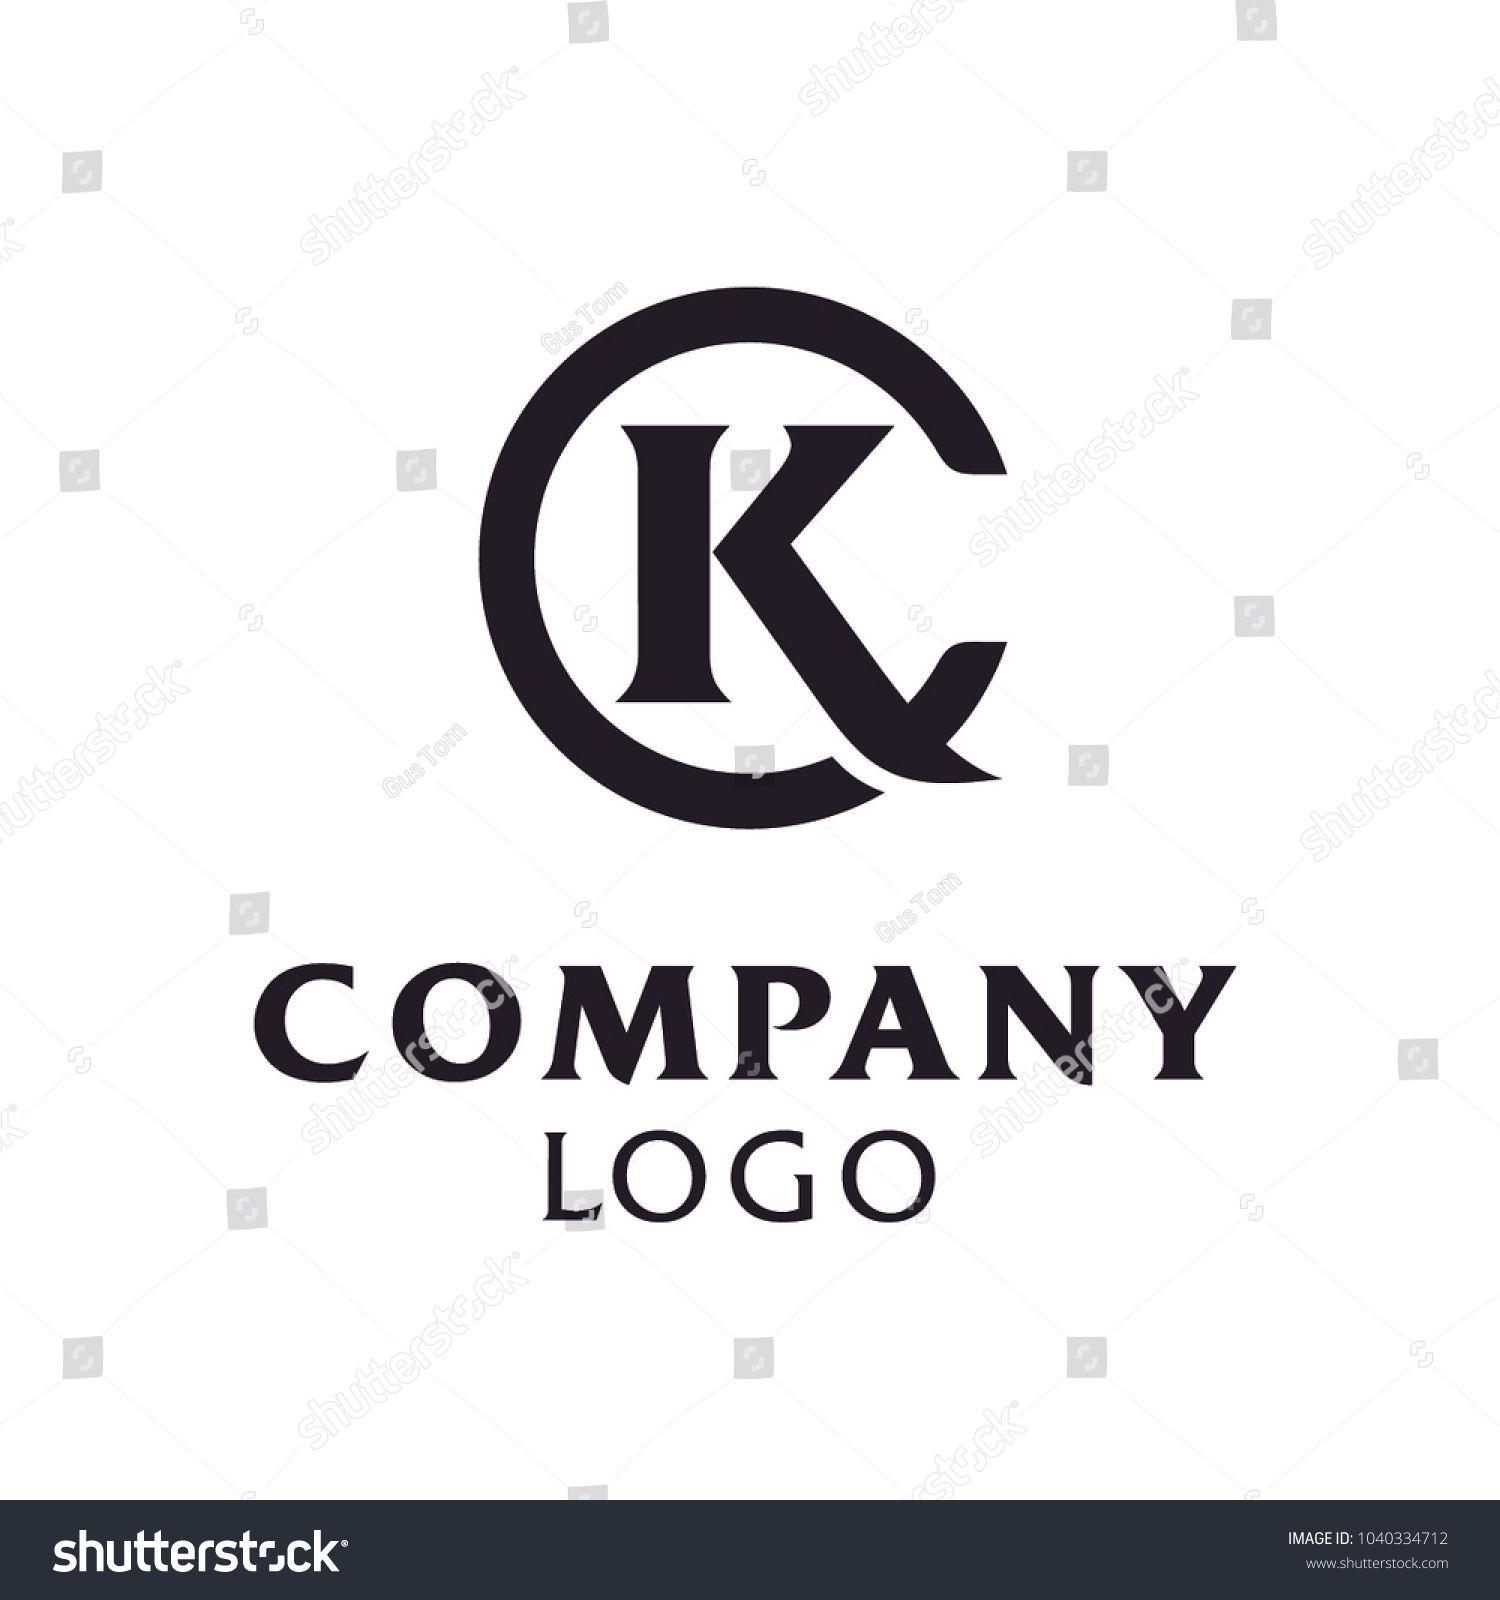 Initials Monogram Letter C K, KC, CK, logo design in 2020